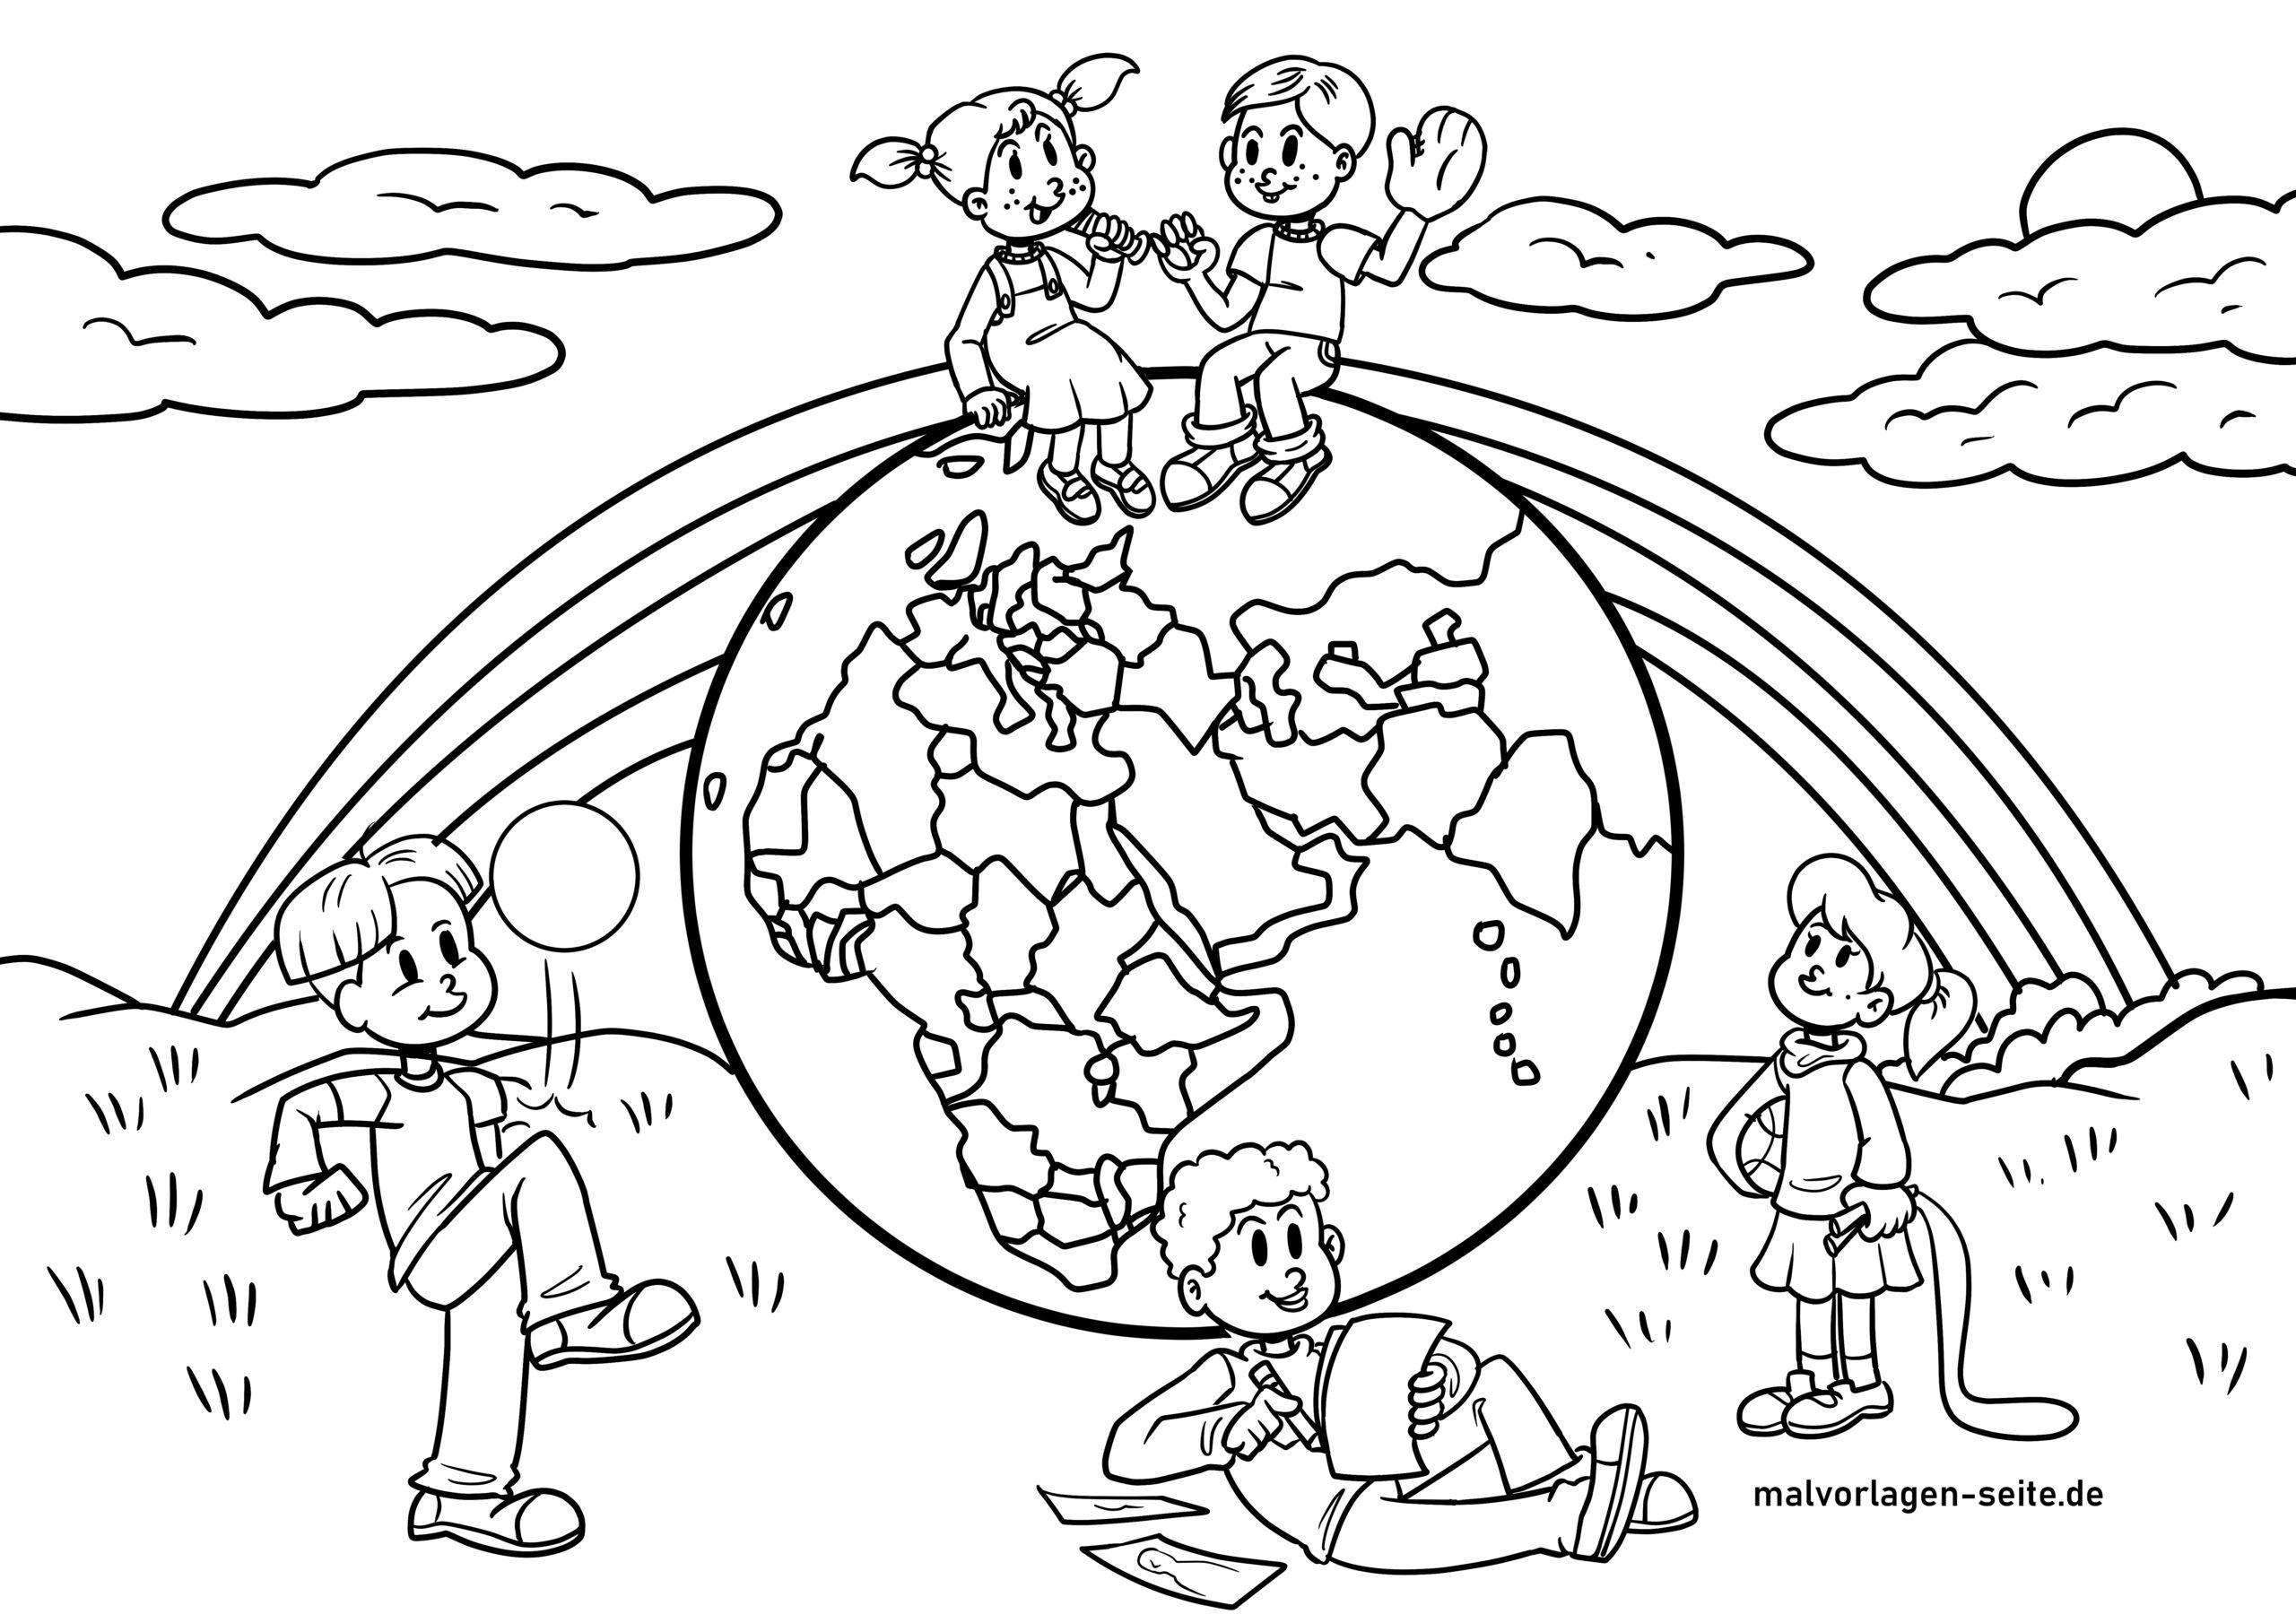 Halaman mewarnai anak-anak bumi